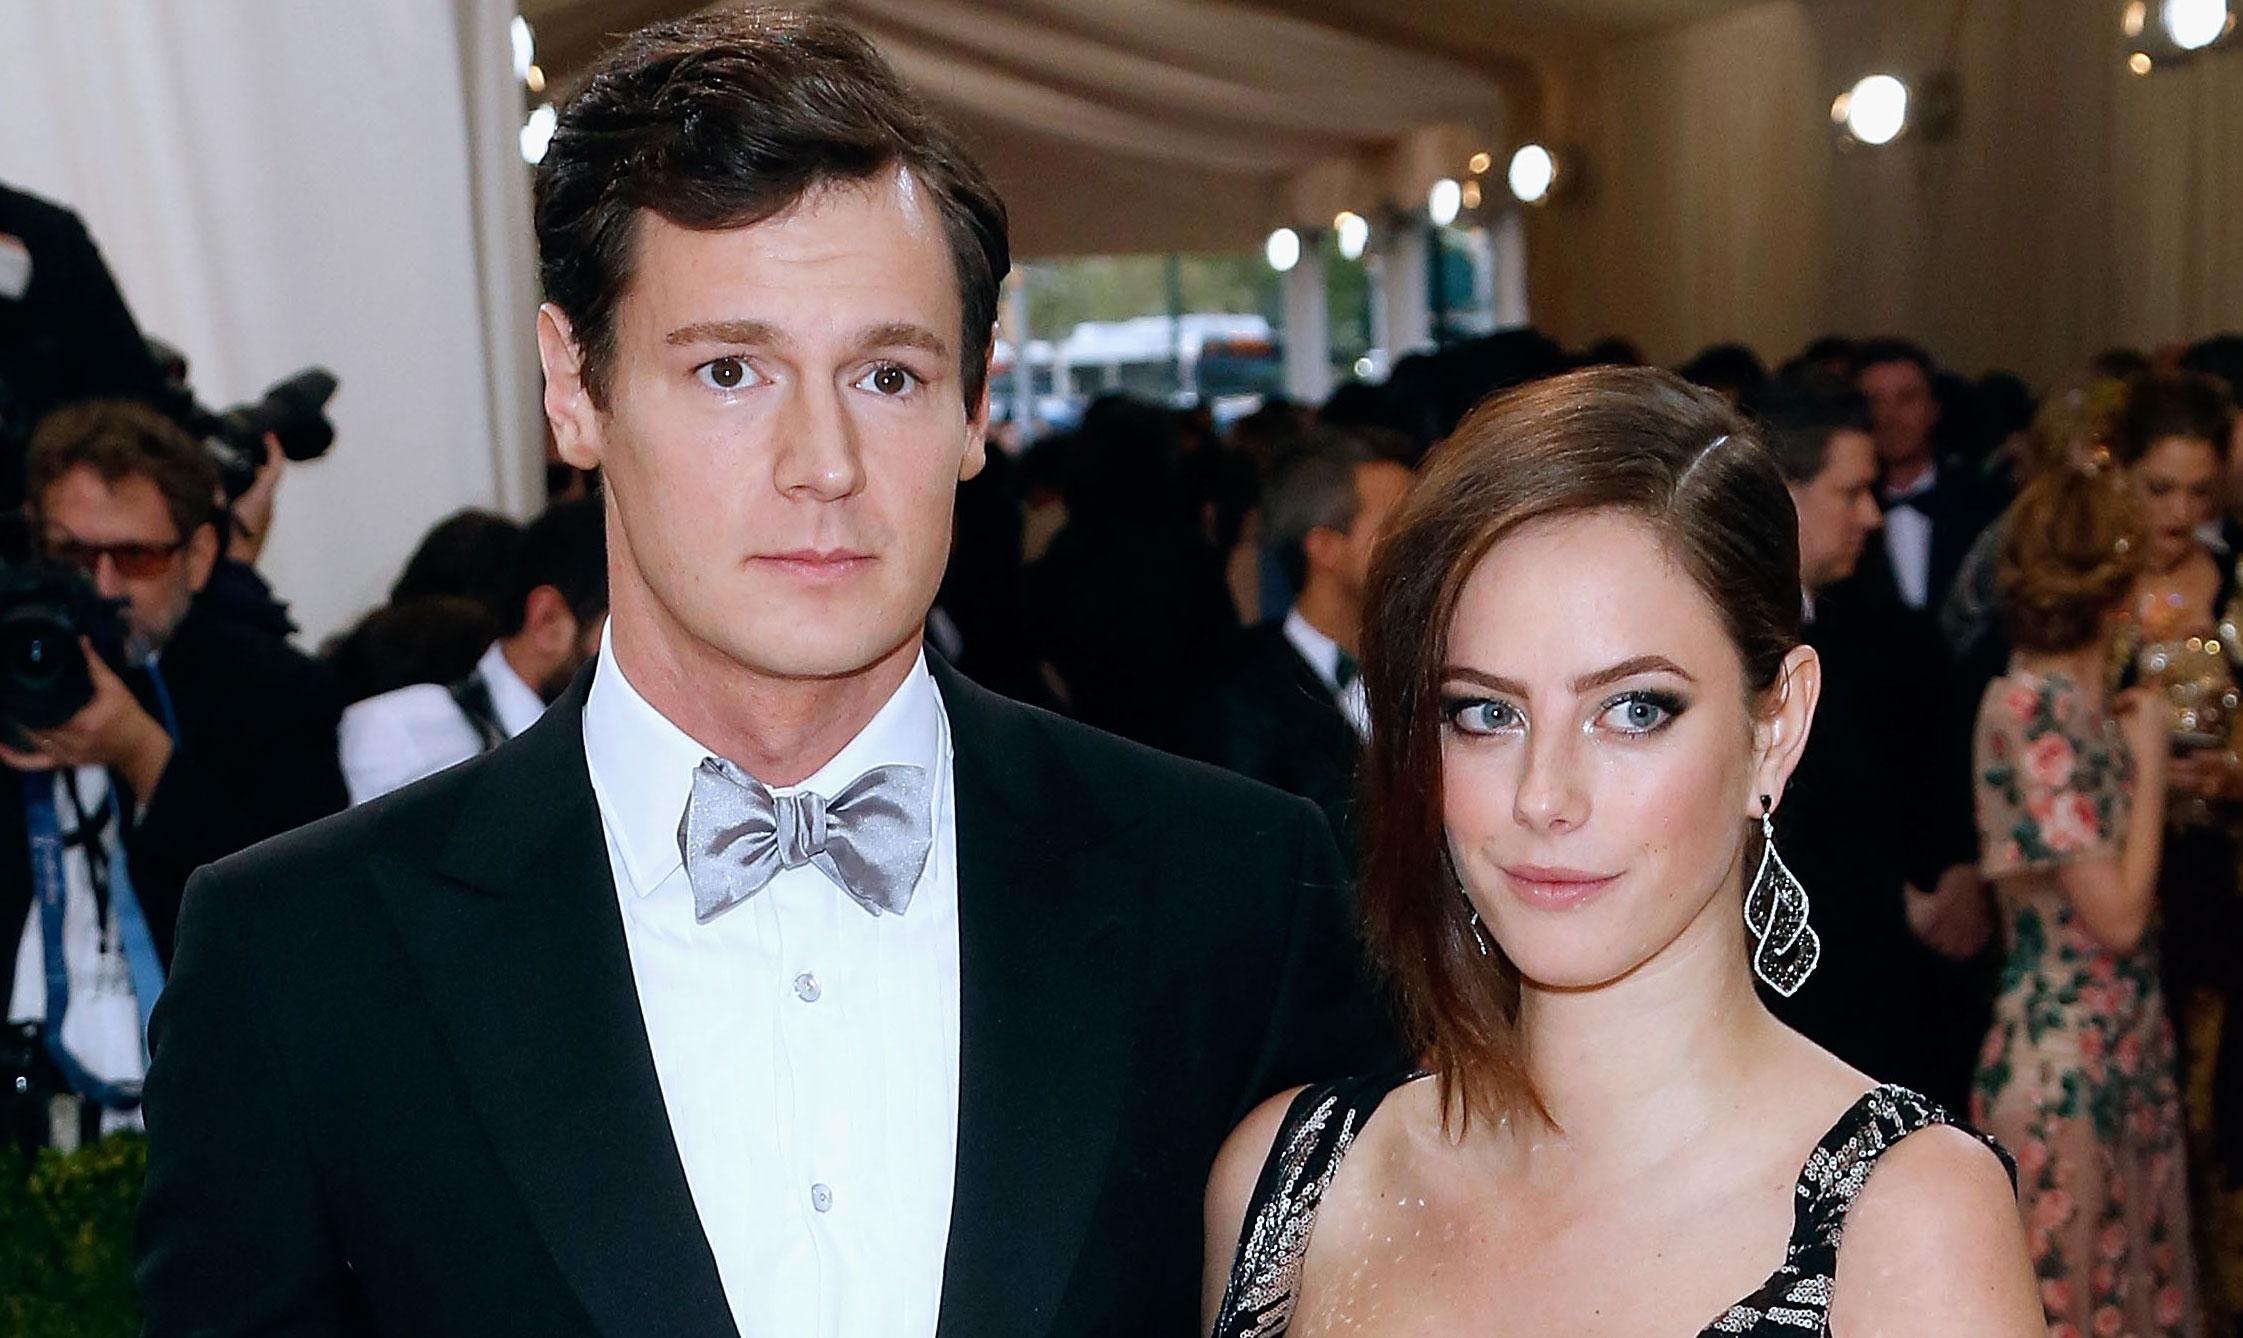 Happily married husband and wife: Benjamin Walker and Kaya Scodelario